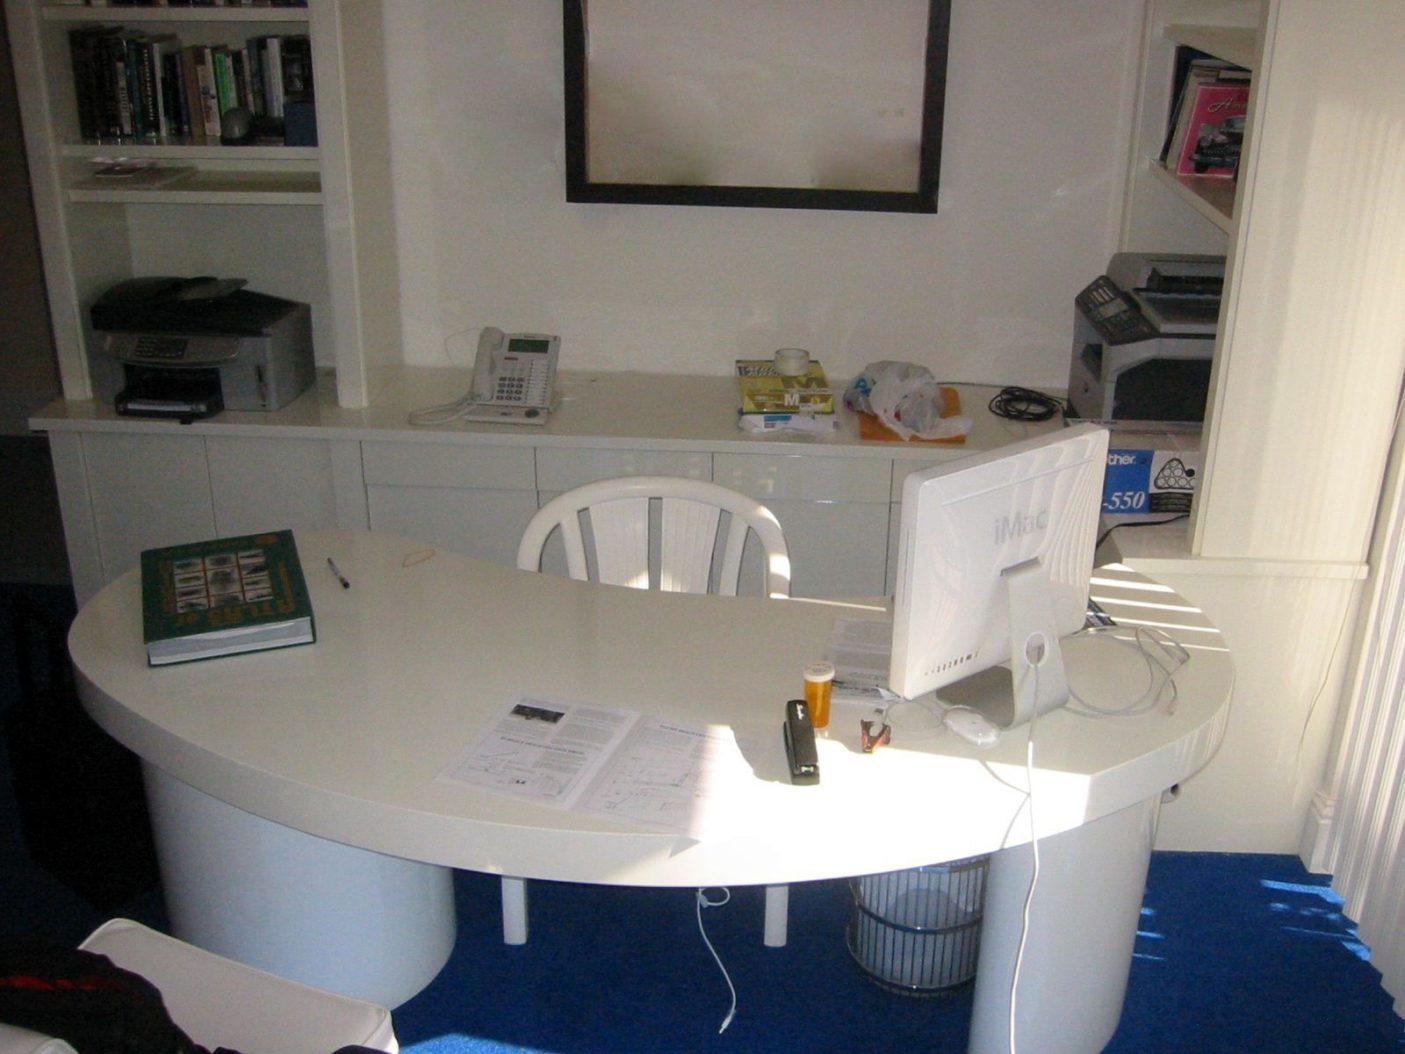 Desks-6.jpg